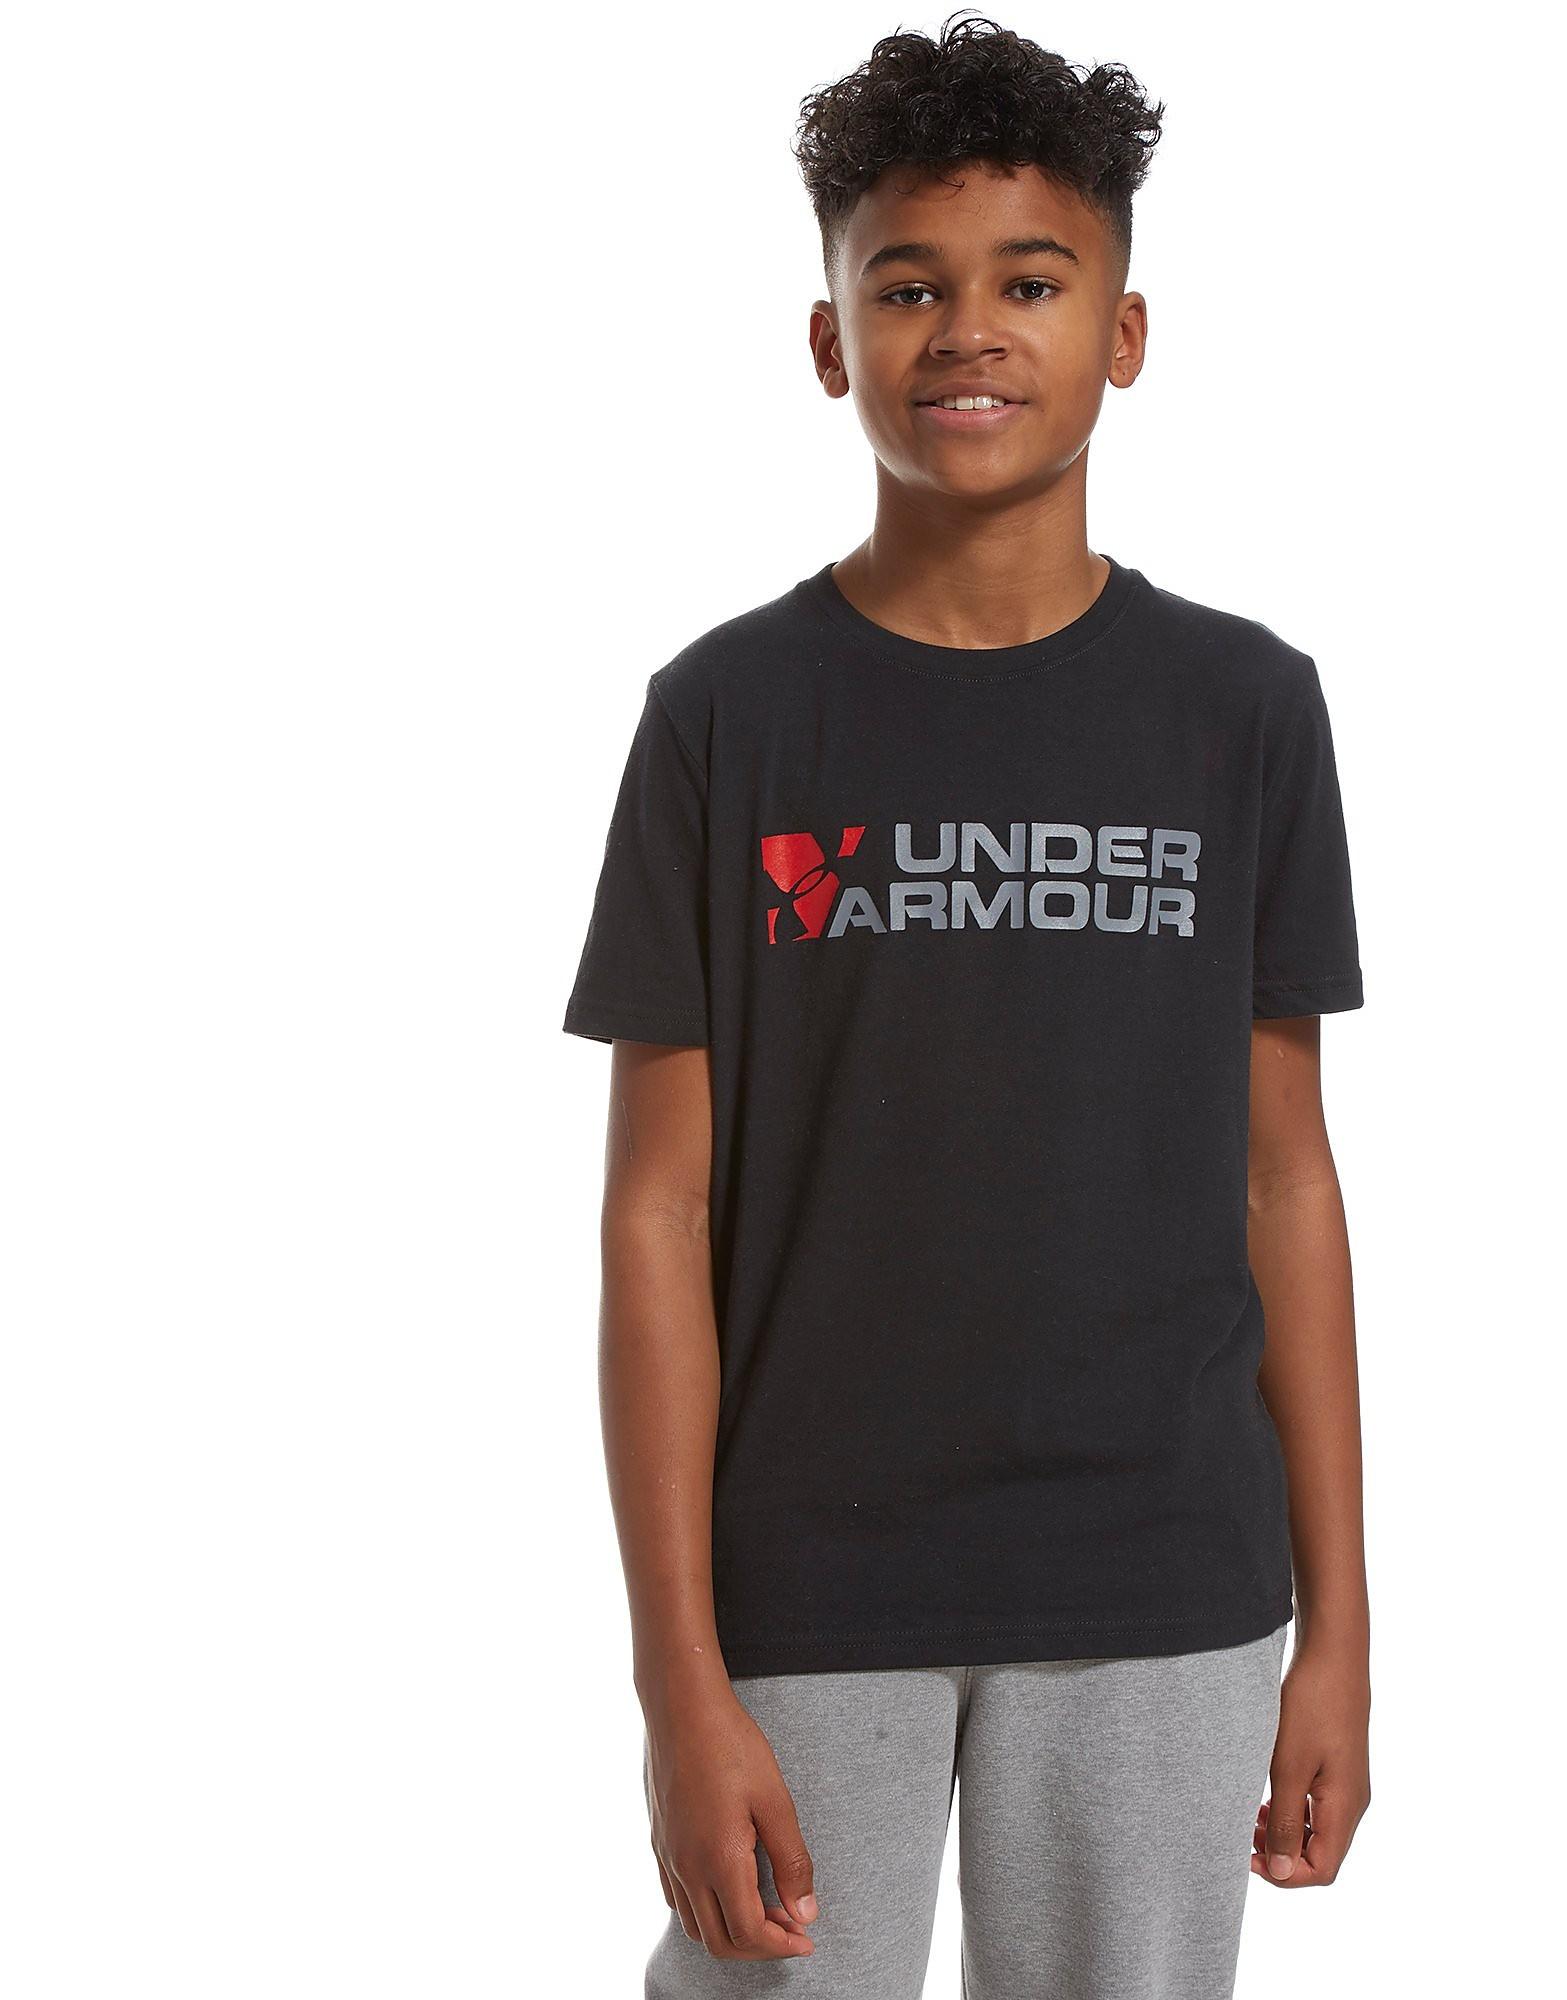 Under Armour Duo Brand T-Shirt Junior